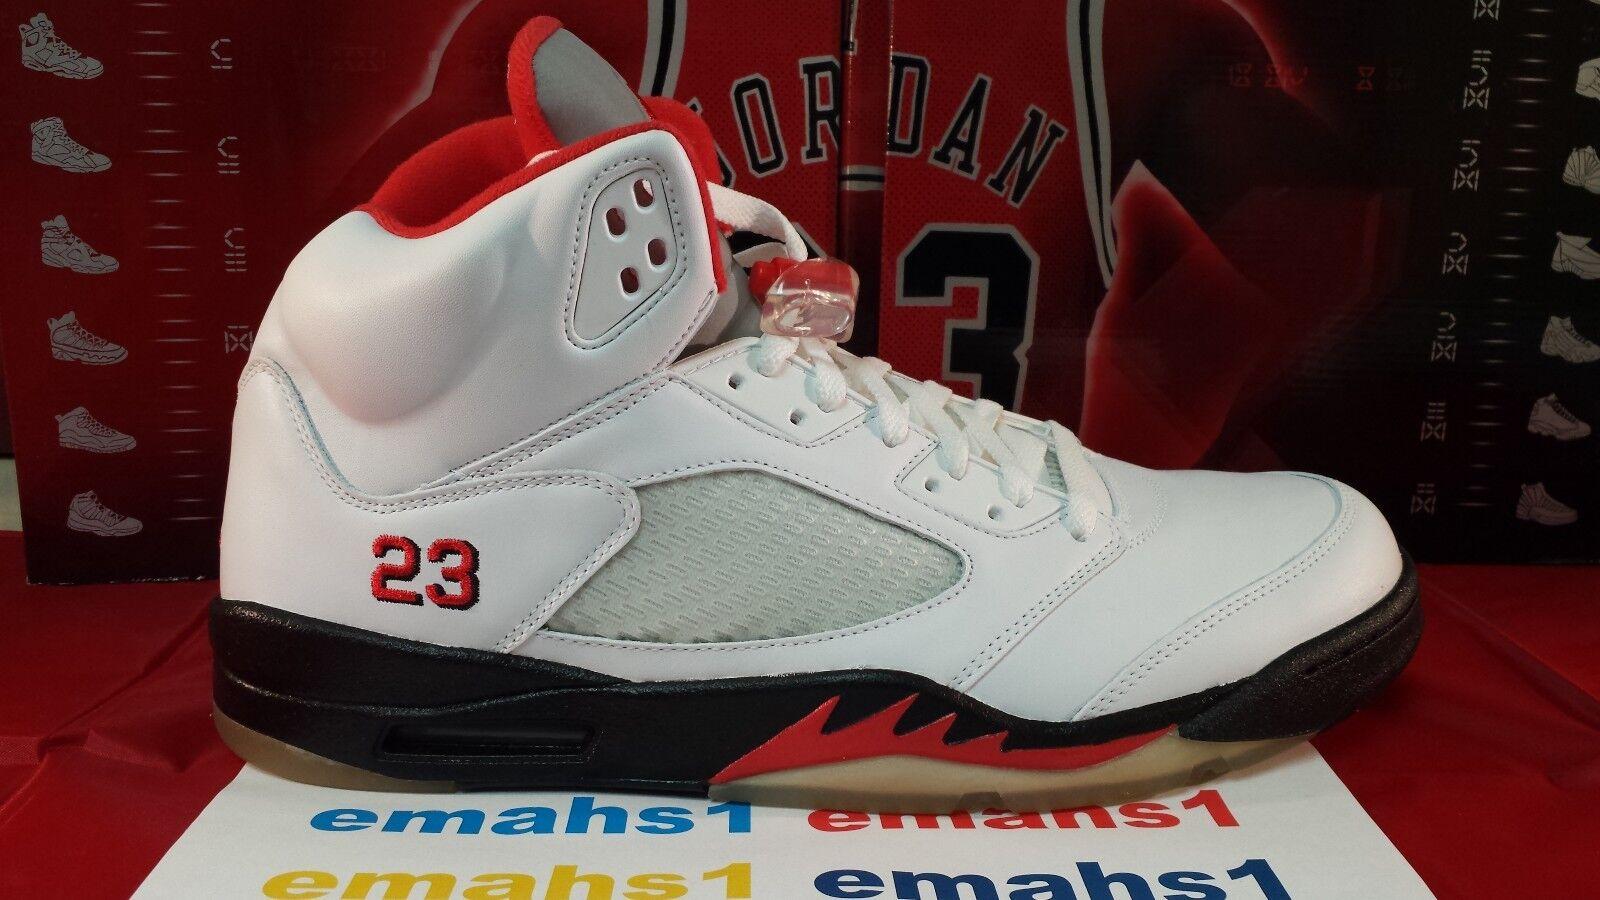 Nike Air Jordan CDP 5 Retro CDP Jordan sz 14 V iv xi toro chicago bulls dmp supreme xii vi ff5fbb